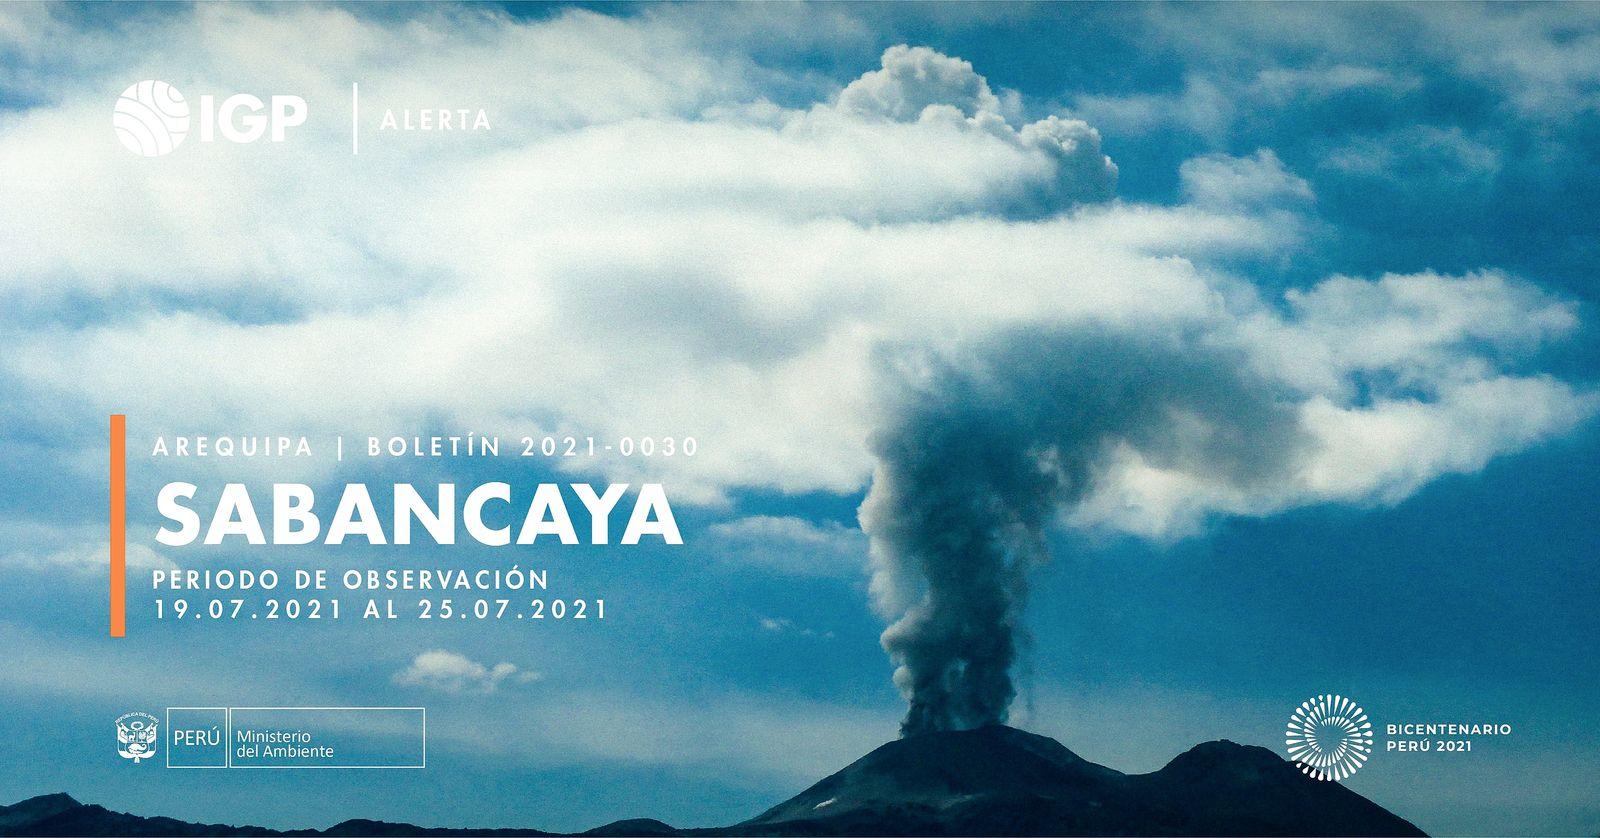 Sabancaya - activity from July 19 to 25, 2021 (bifid plume) - photo I.G. Peru